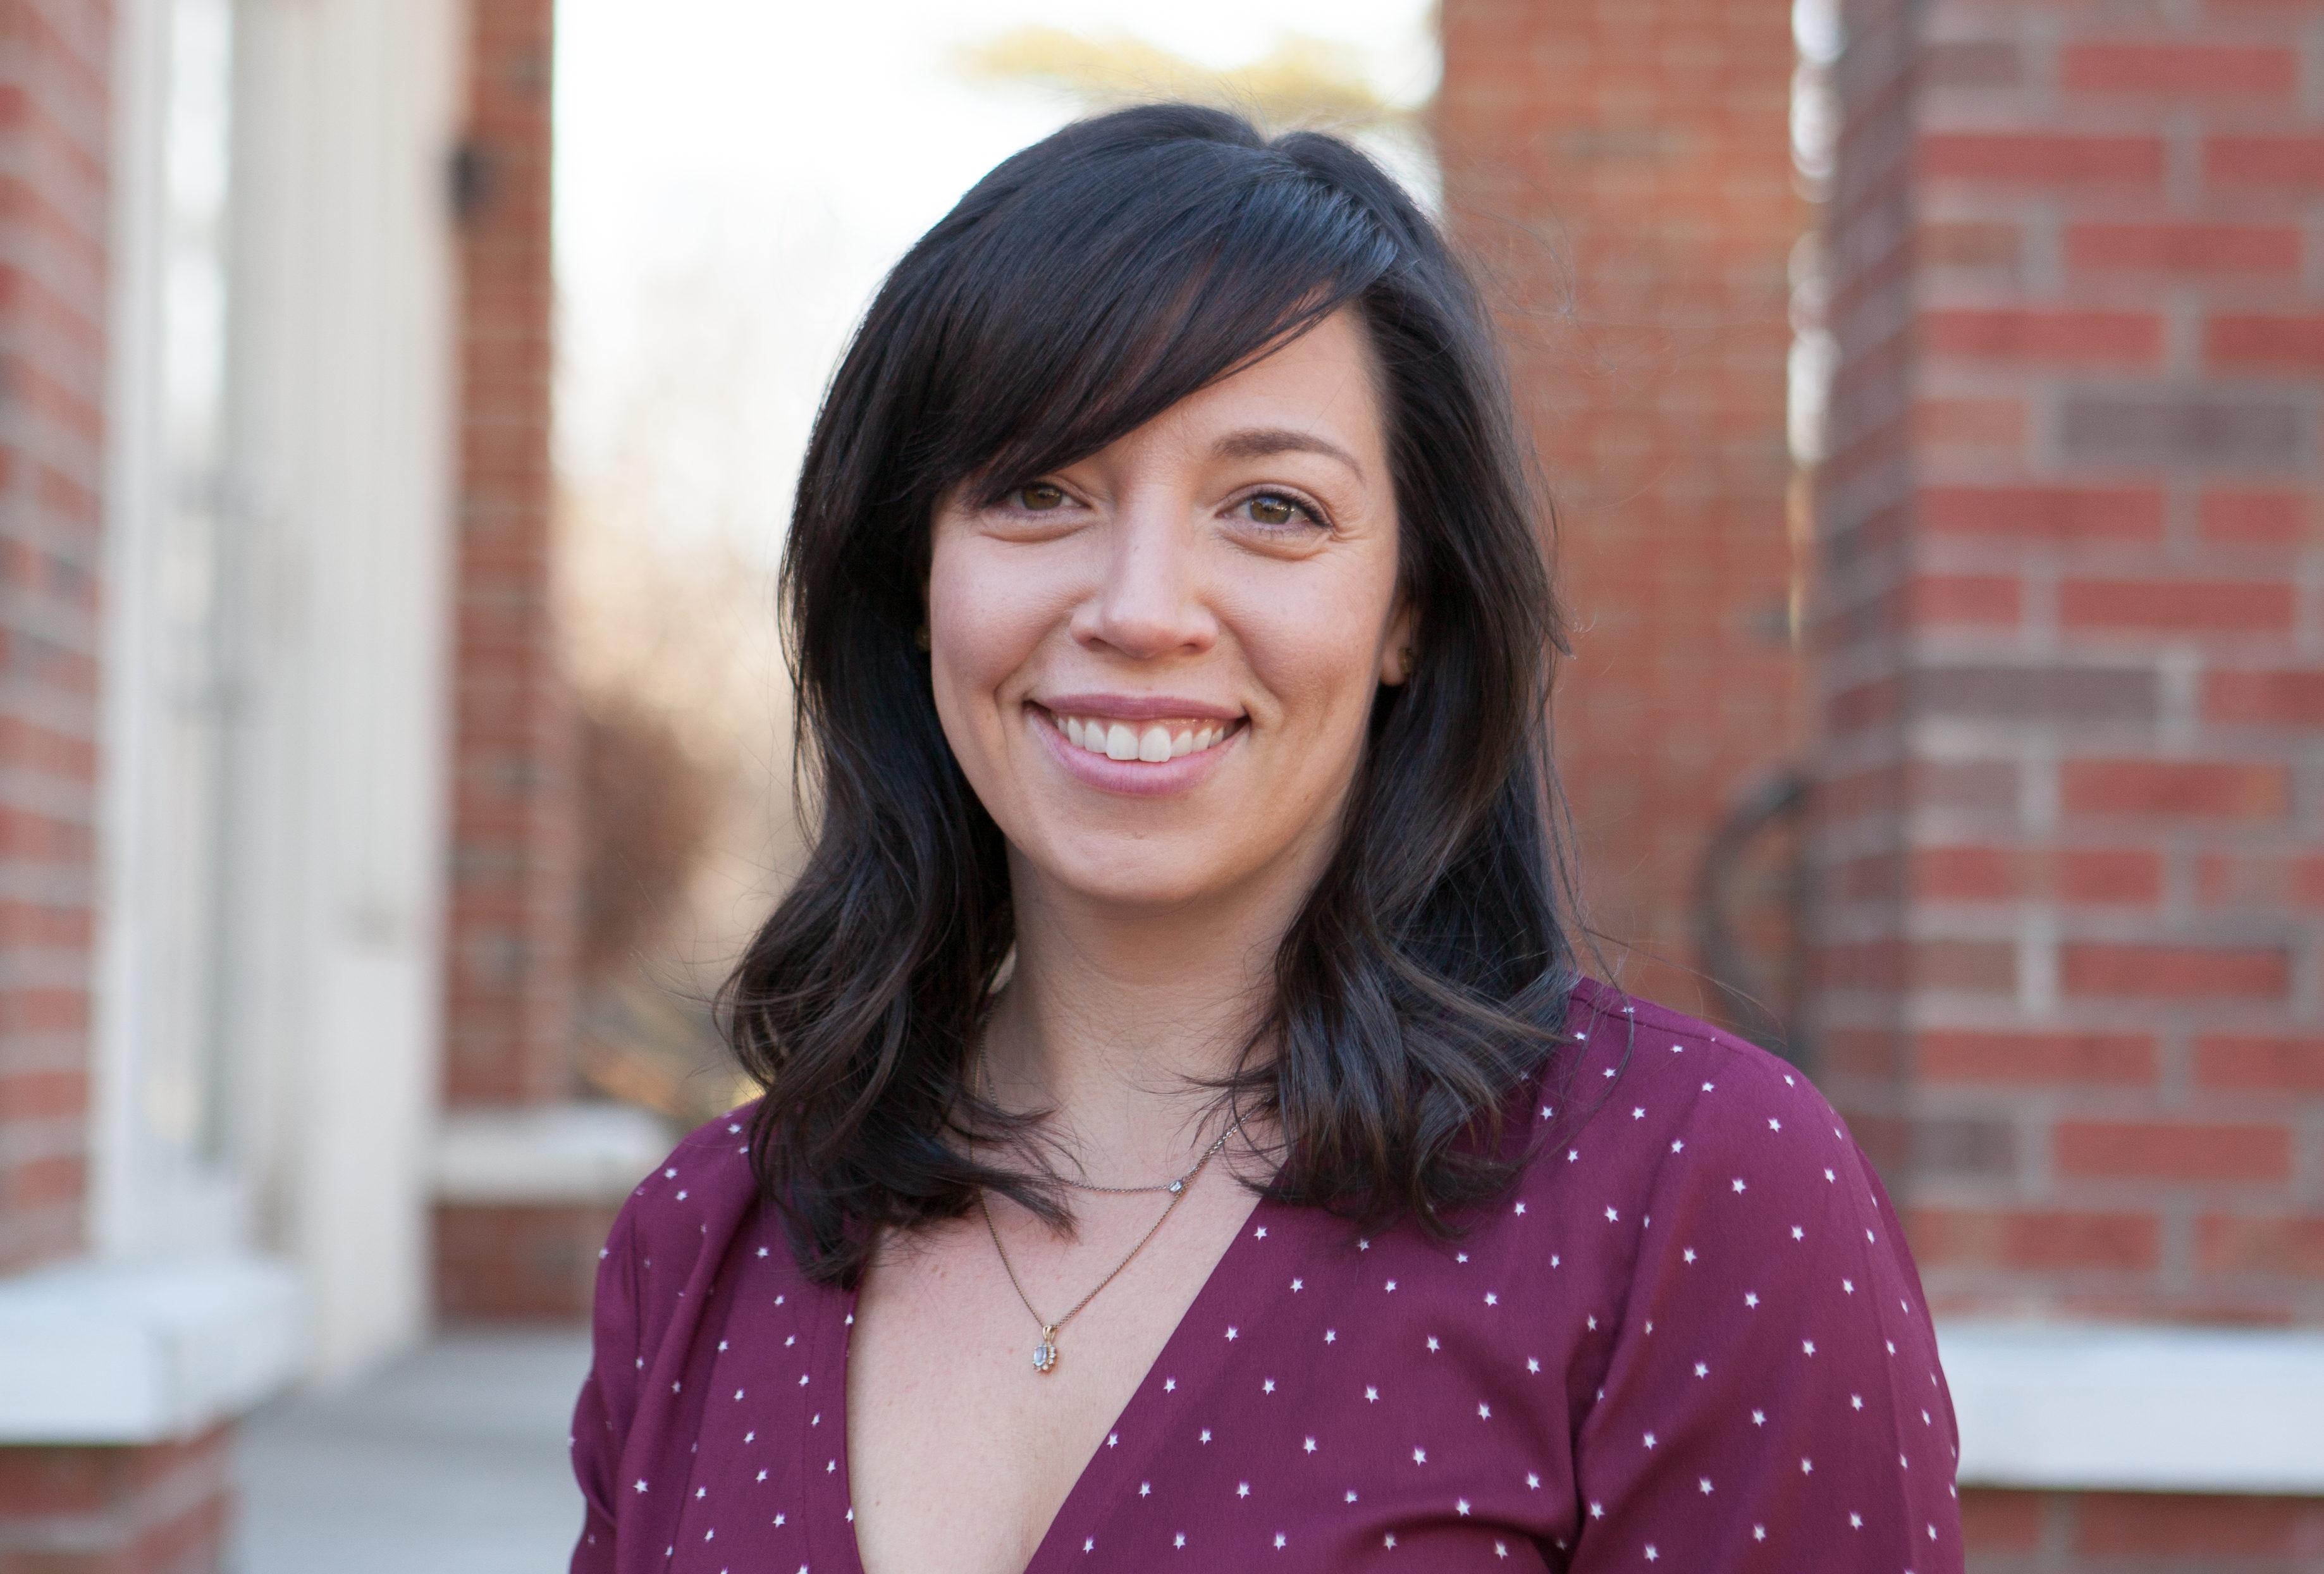 Dr. Conny Garefino, Family Chiropractor, explains her technique